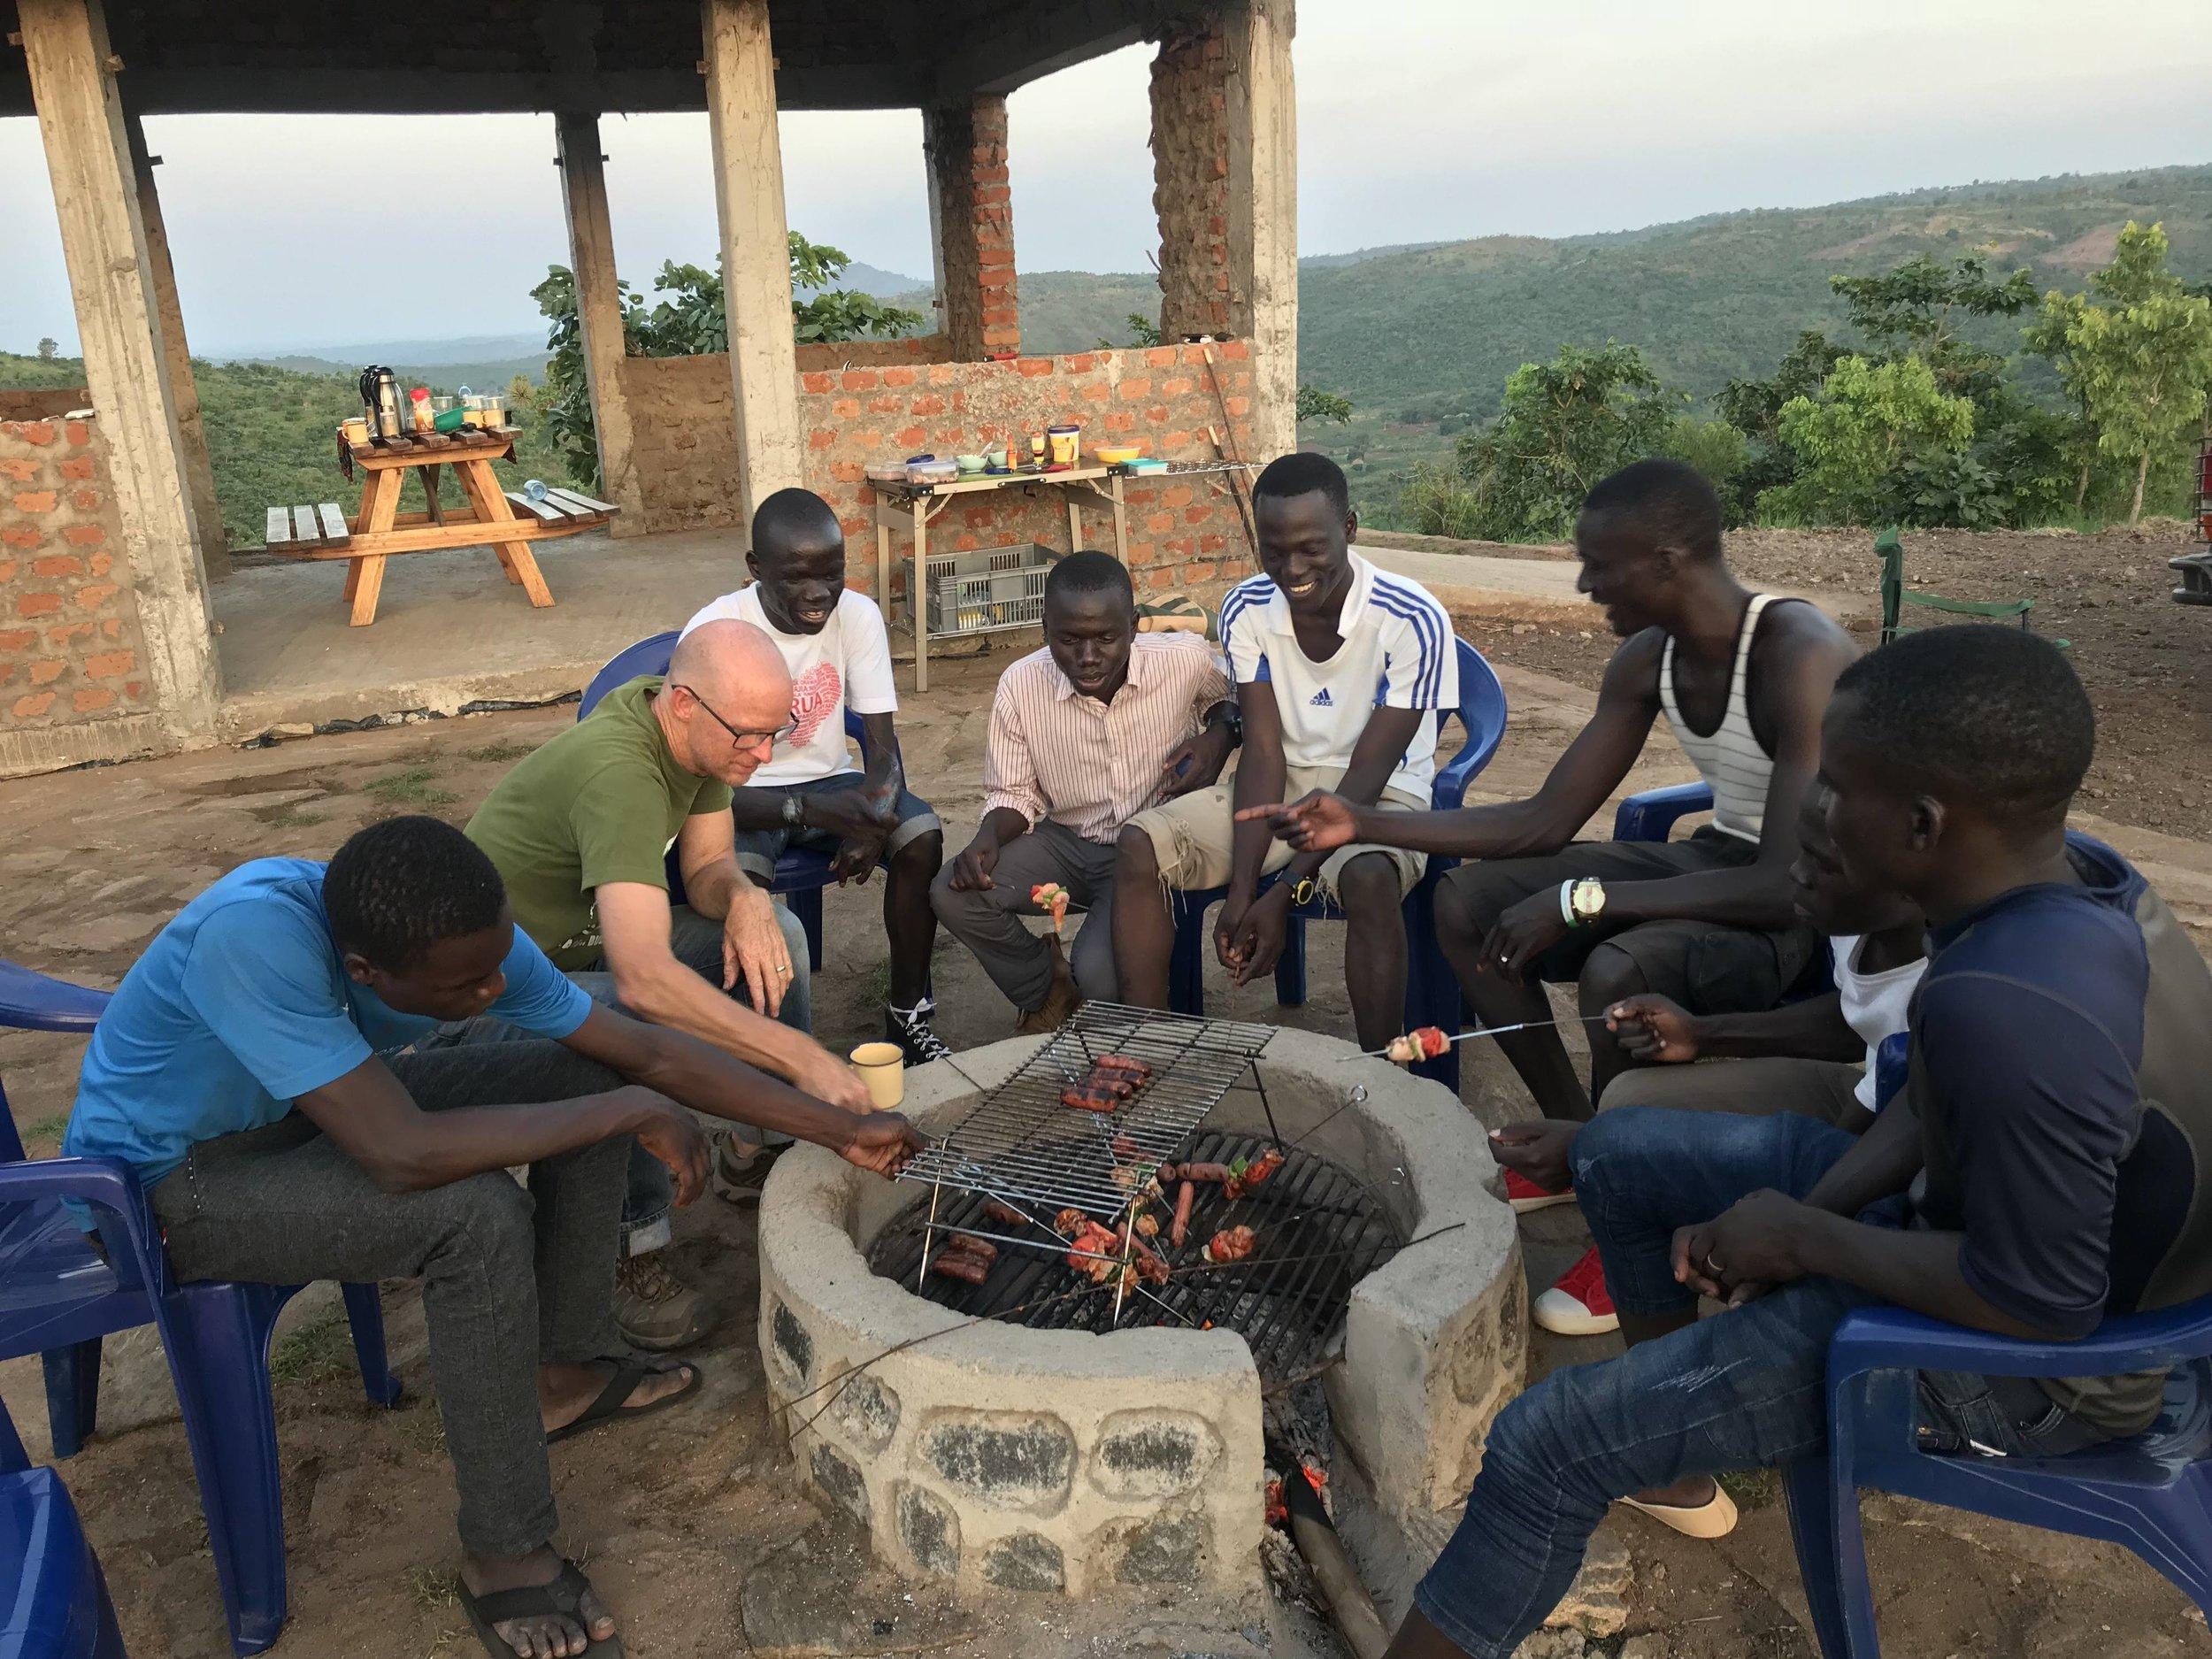 arise-discipleship-retreat-center-aura-uganda-hisvoice.jpg